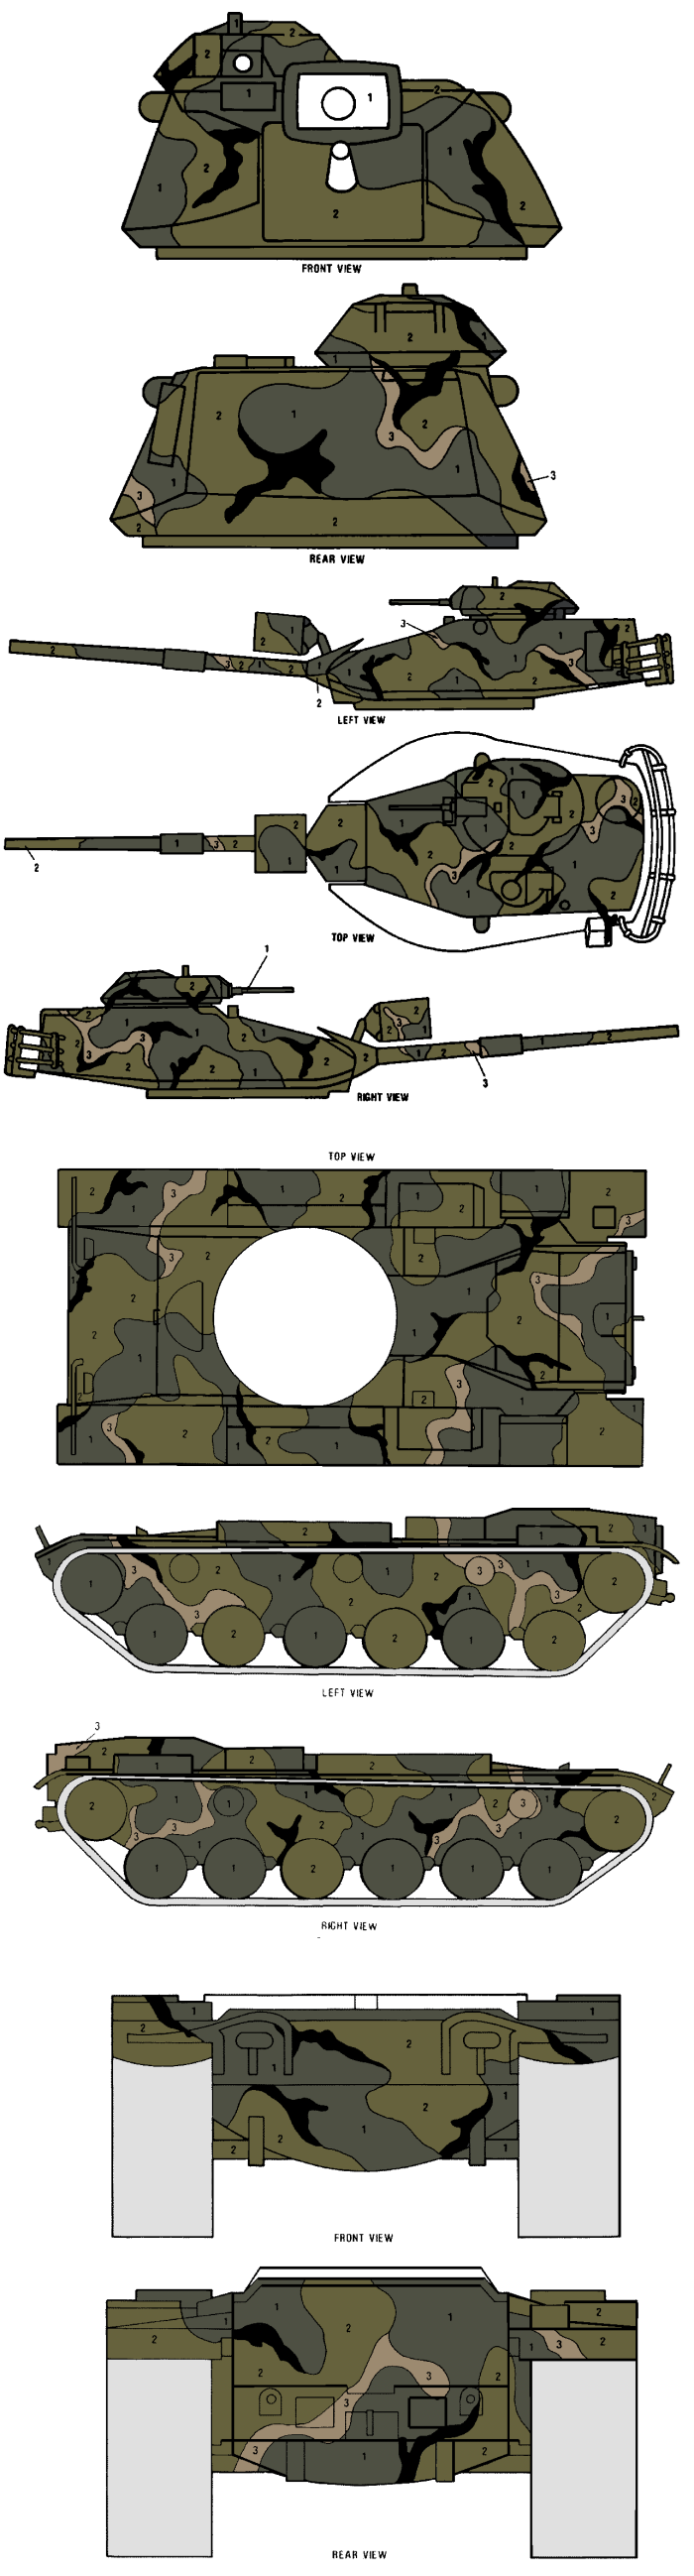 M60a1 M60a3 Merdc Summer Verdant Camouflage Color Profile And Paint Guide Camouflage Colors Color Profile Desert Colors